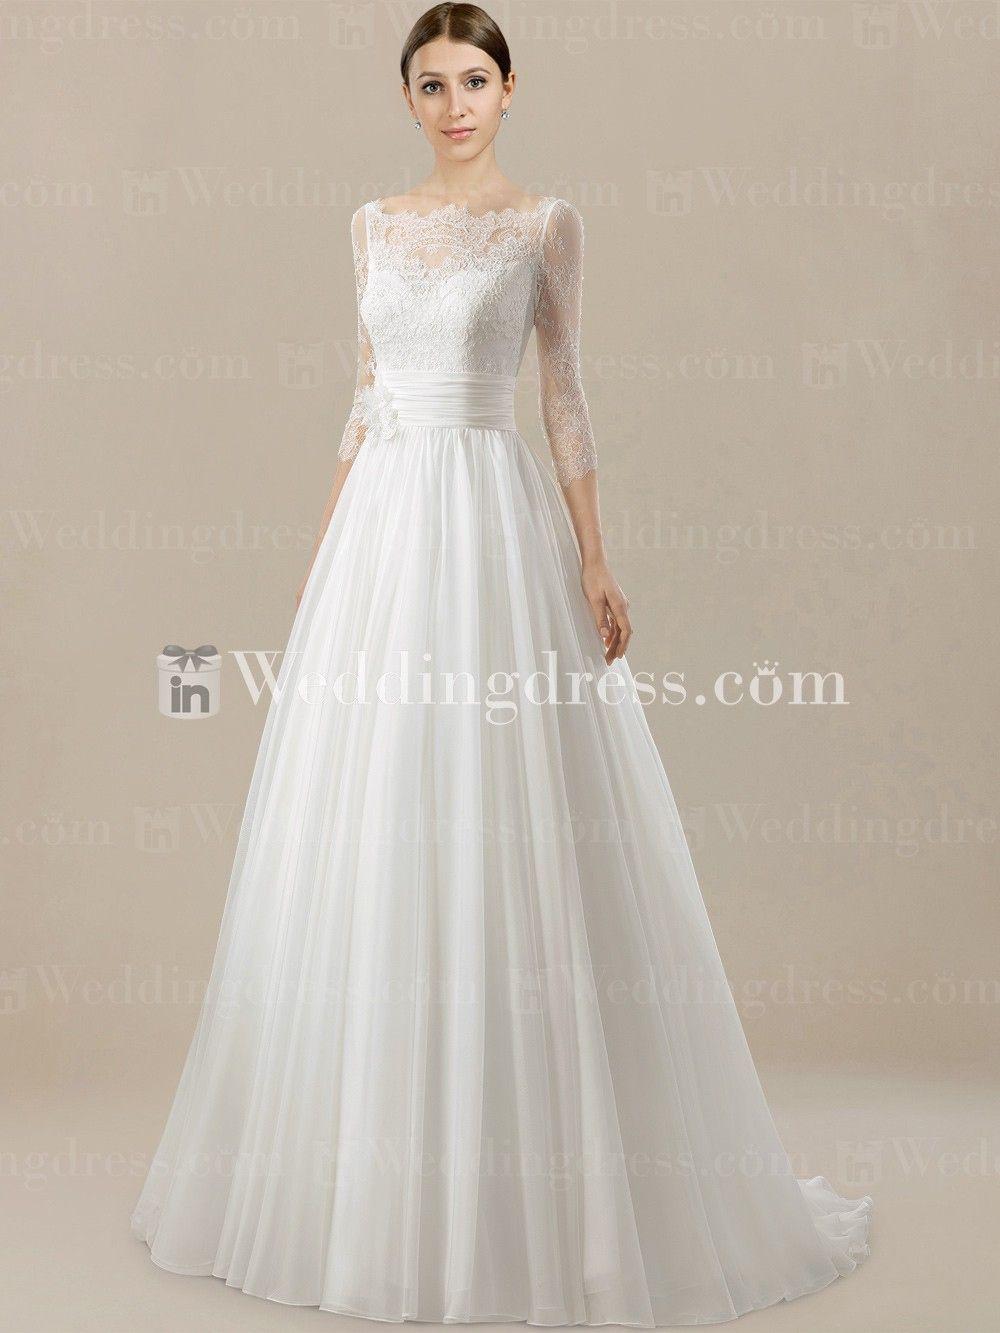 Simple Wedding Dress Sleeves - Informal Wedding Dresses for Older ...